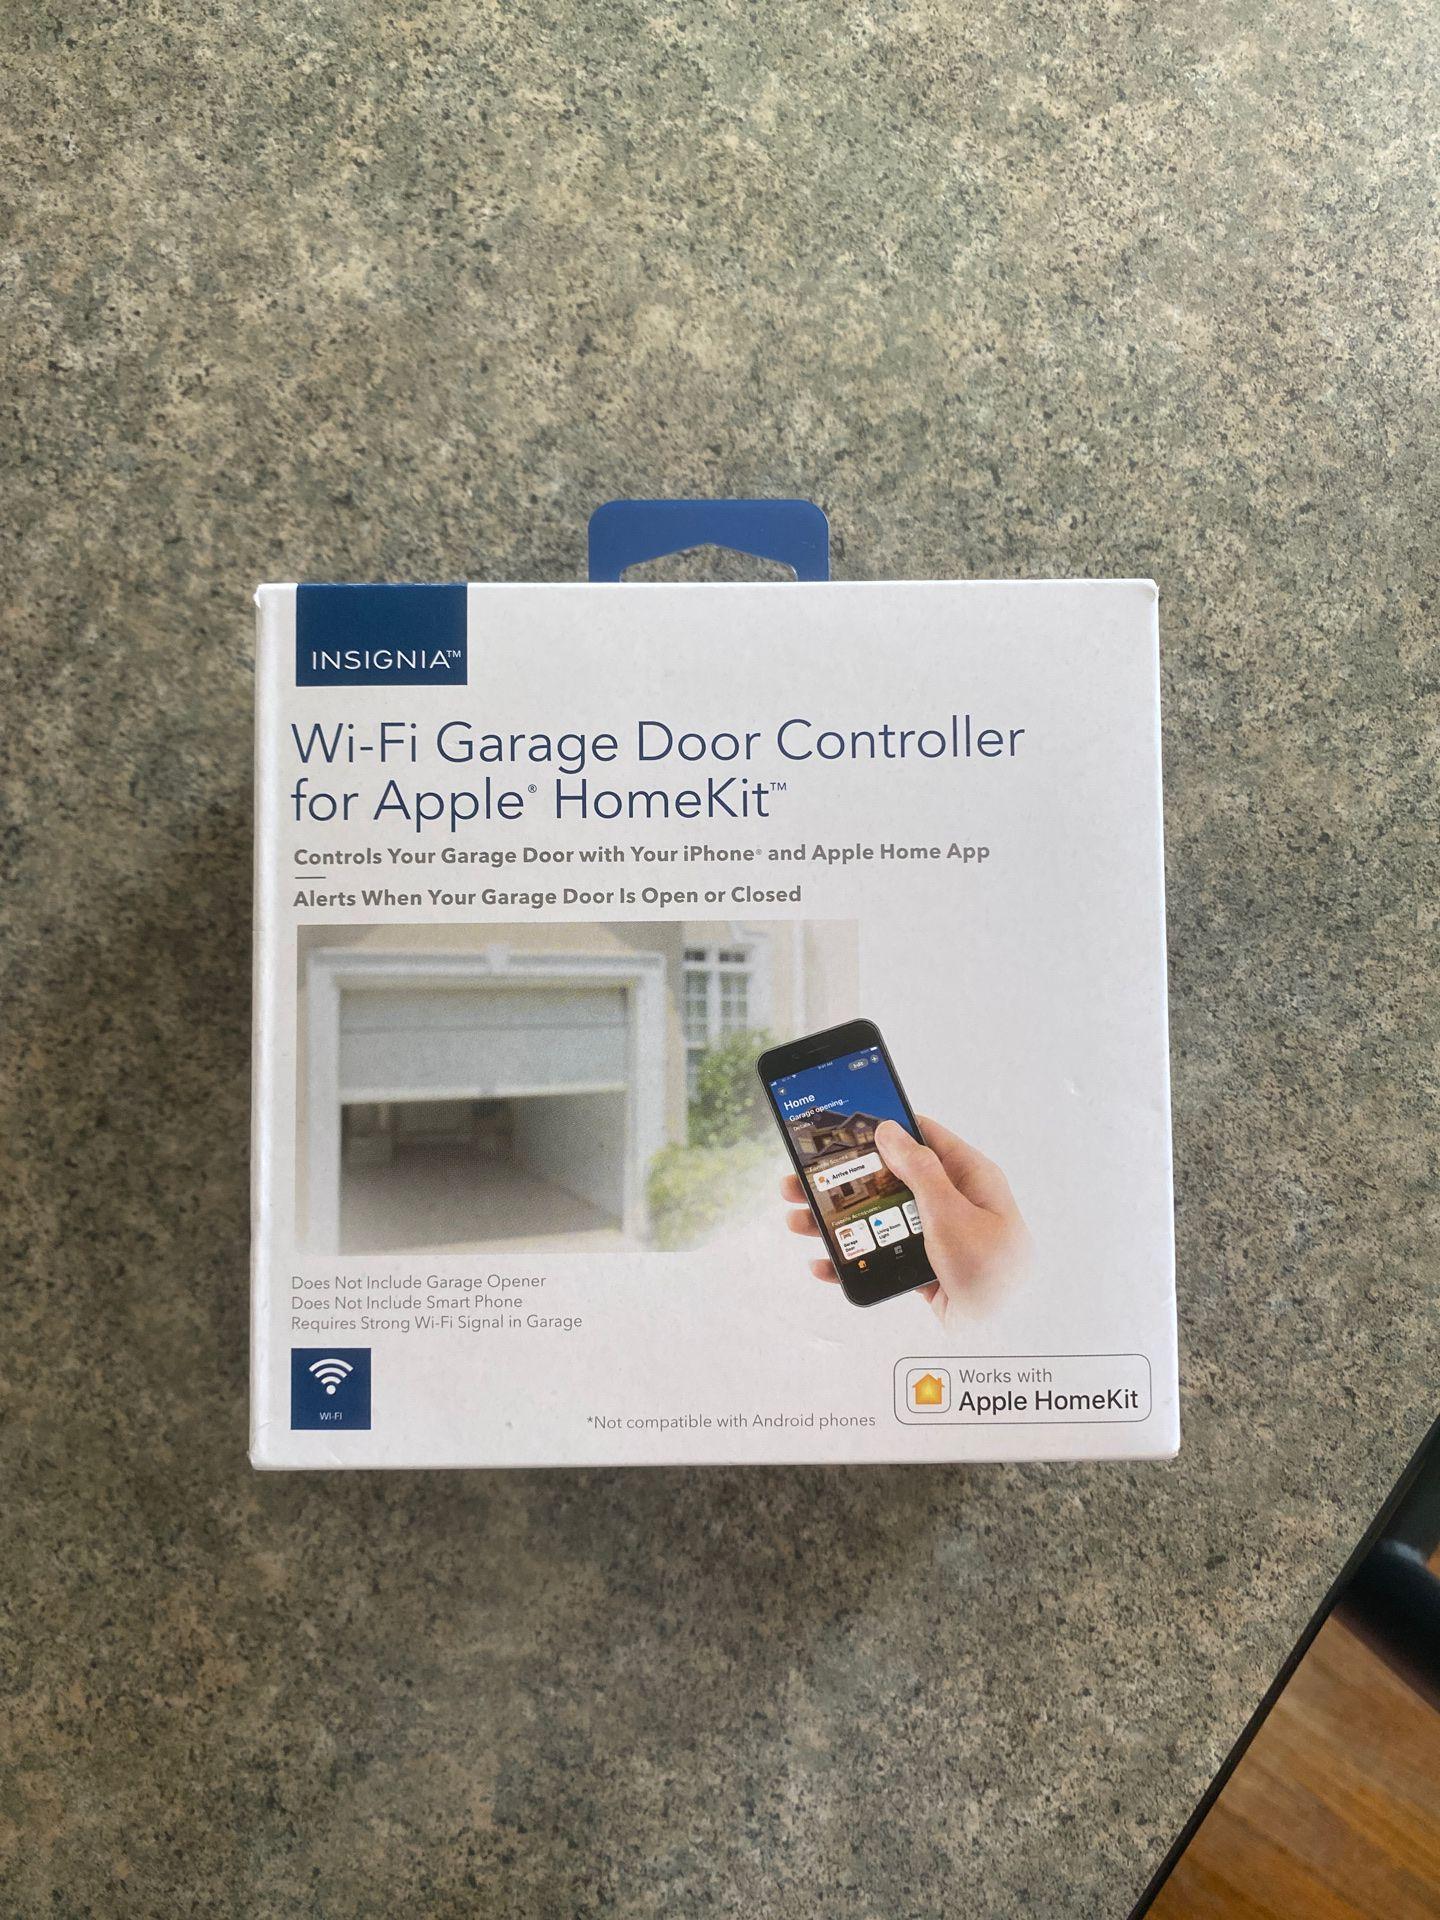 Insignia wi-fi garage door controller